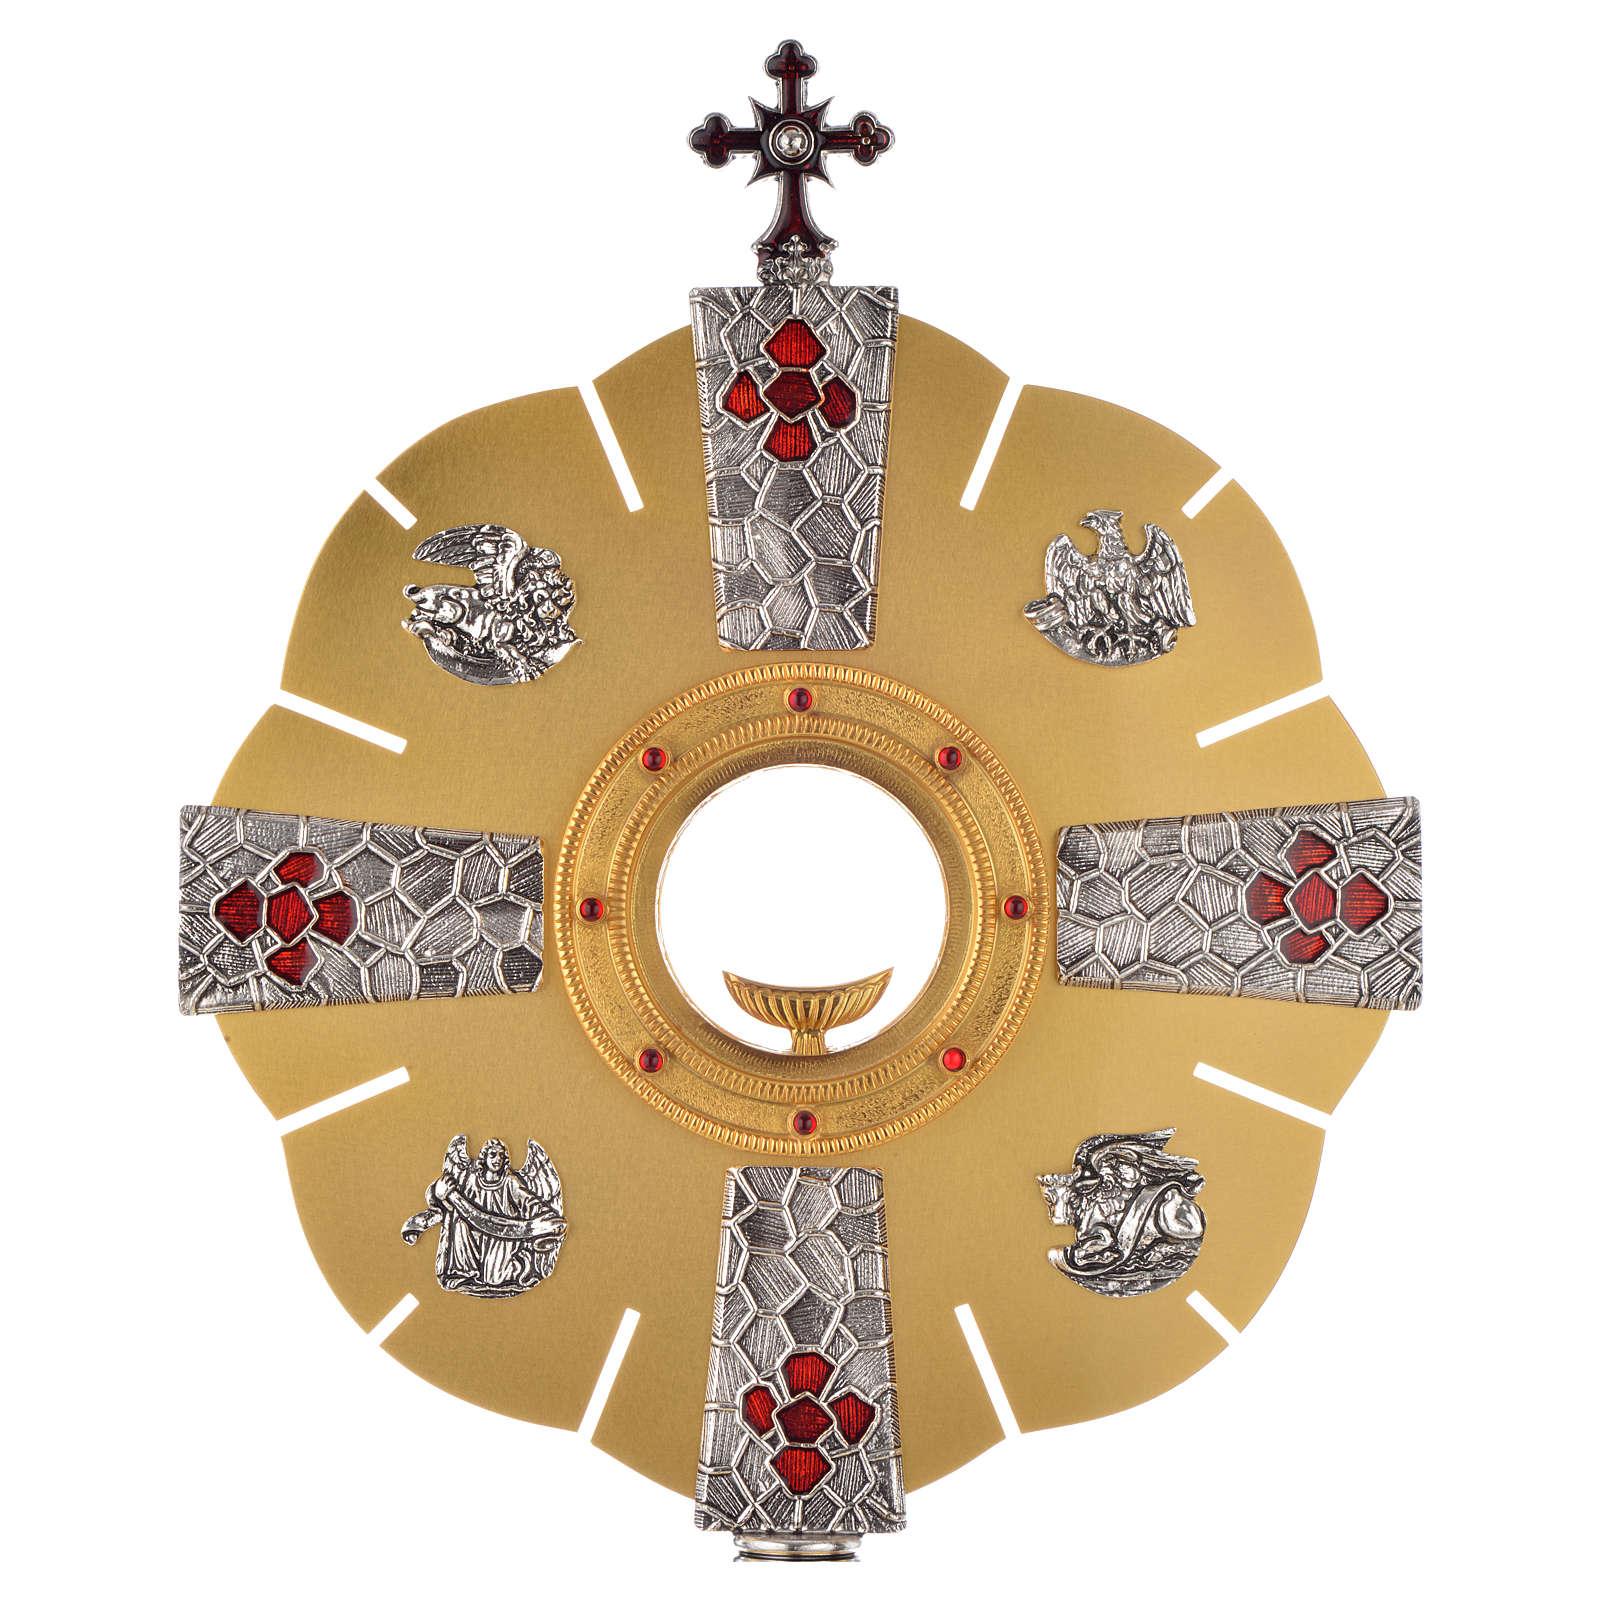 Ostensorio símbolos evangelistas 4